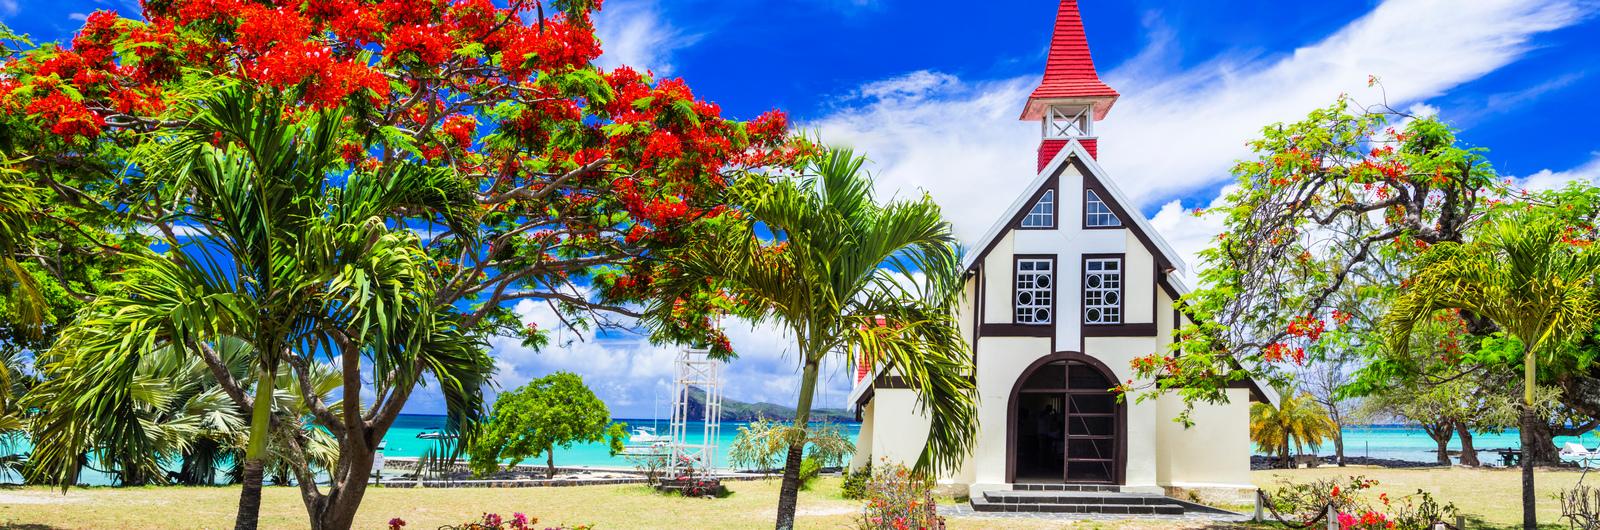 mauritius city header